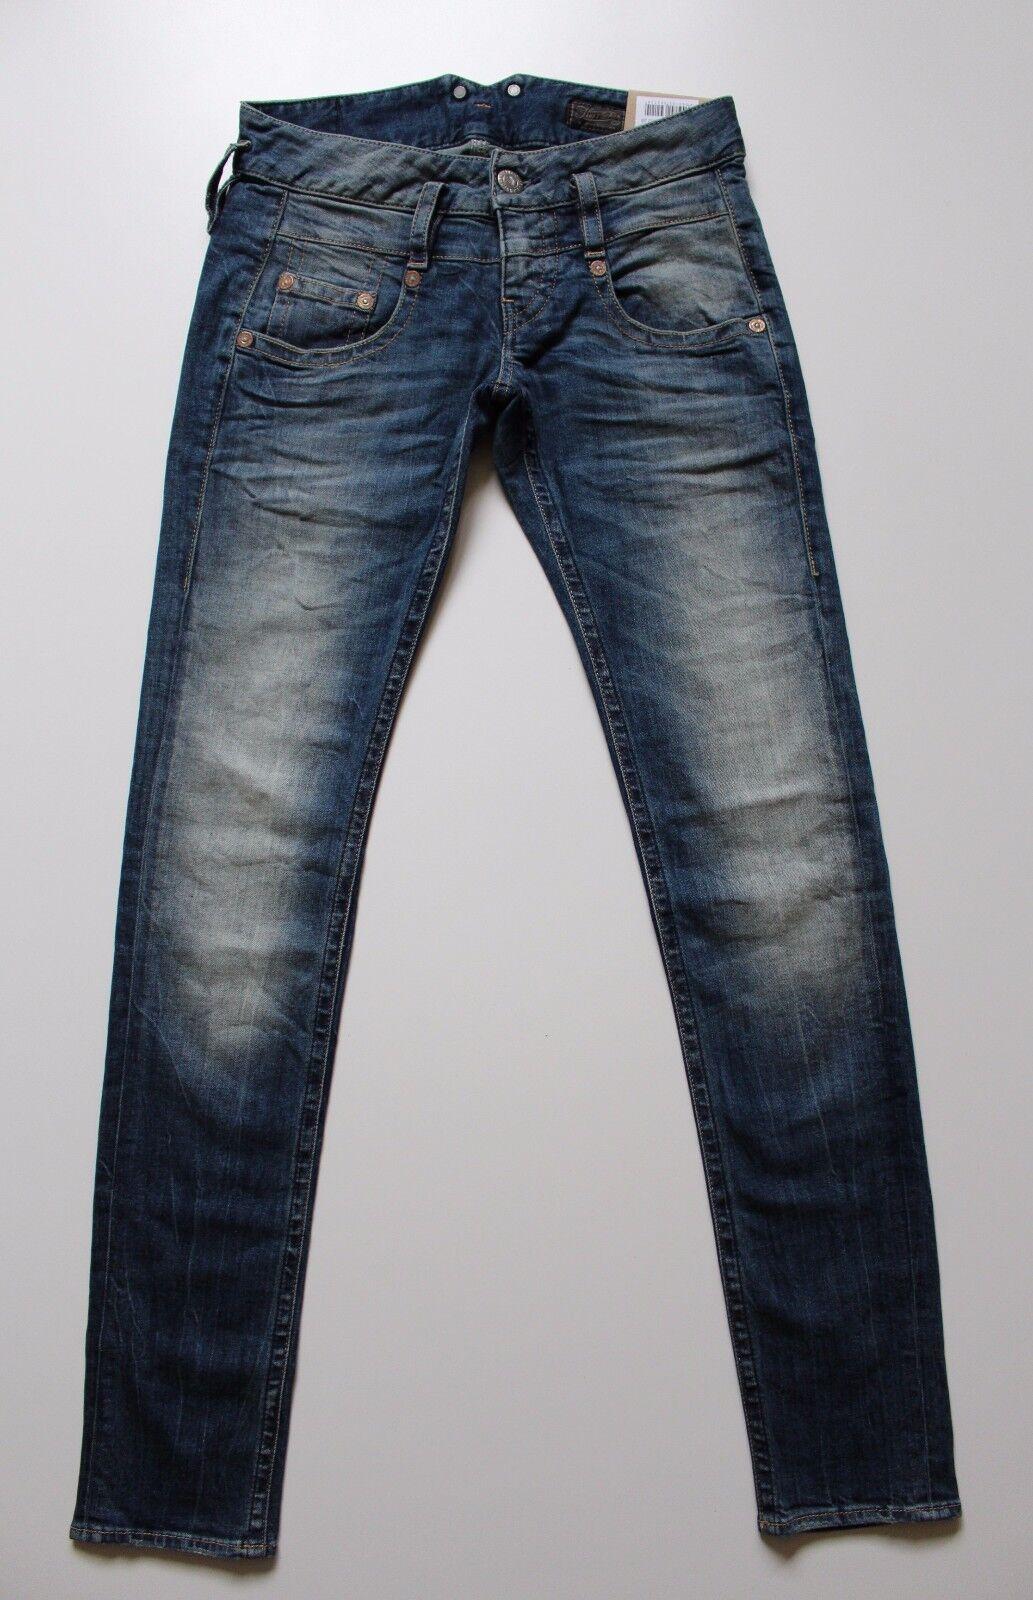 Herrlicher Damen Jeans Pitch Slim 5303 D9661 Blau W26 31 32 L32